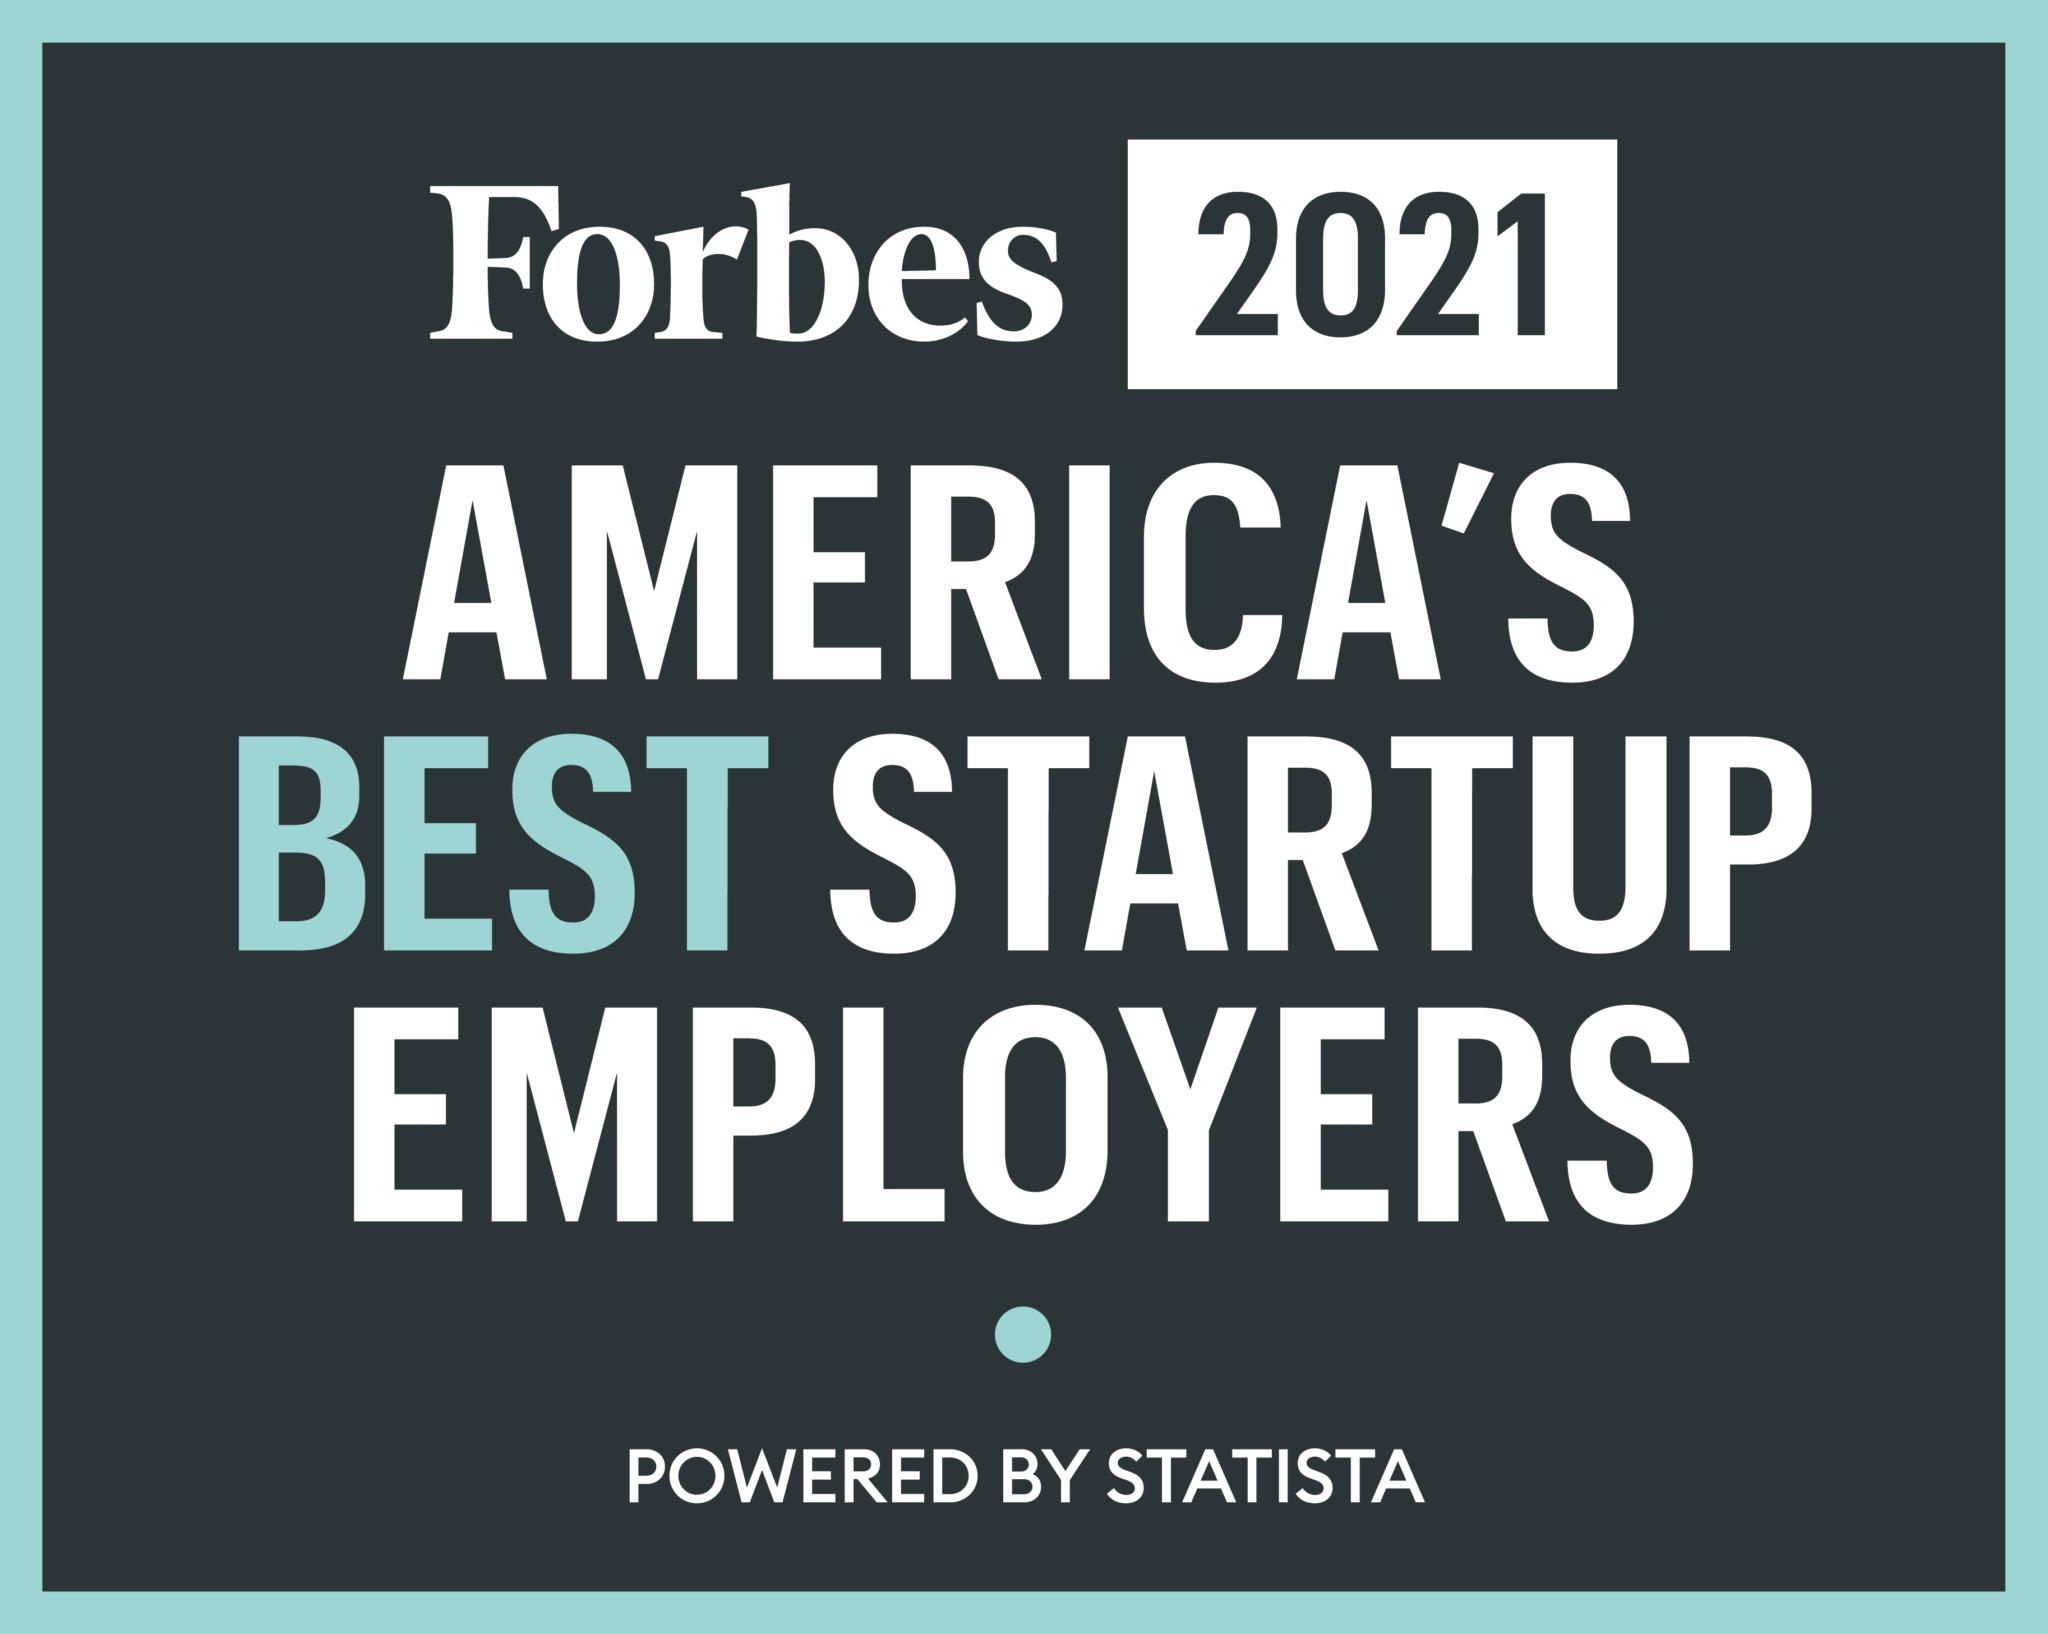 Forbes Us Besu2021 Siegel Color S